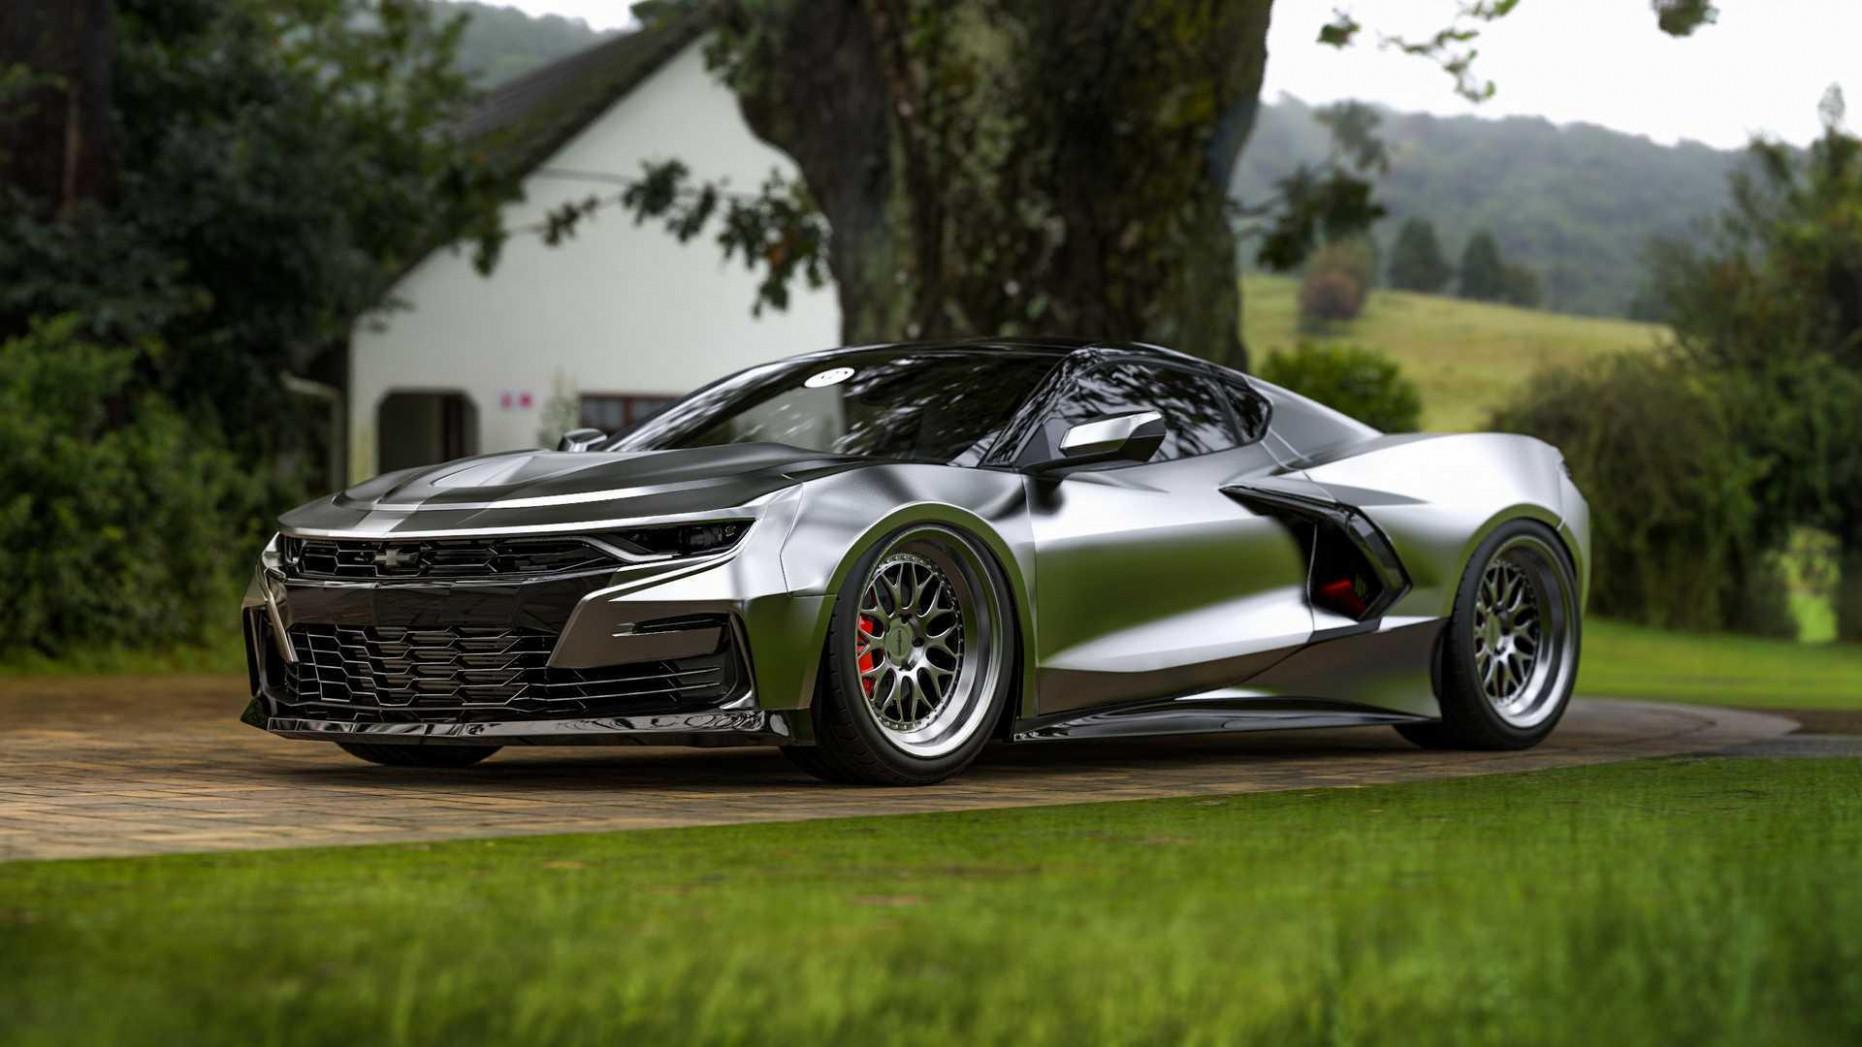 New Concept 2022 Chevrolet Camaro